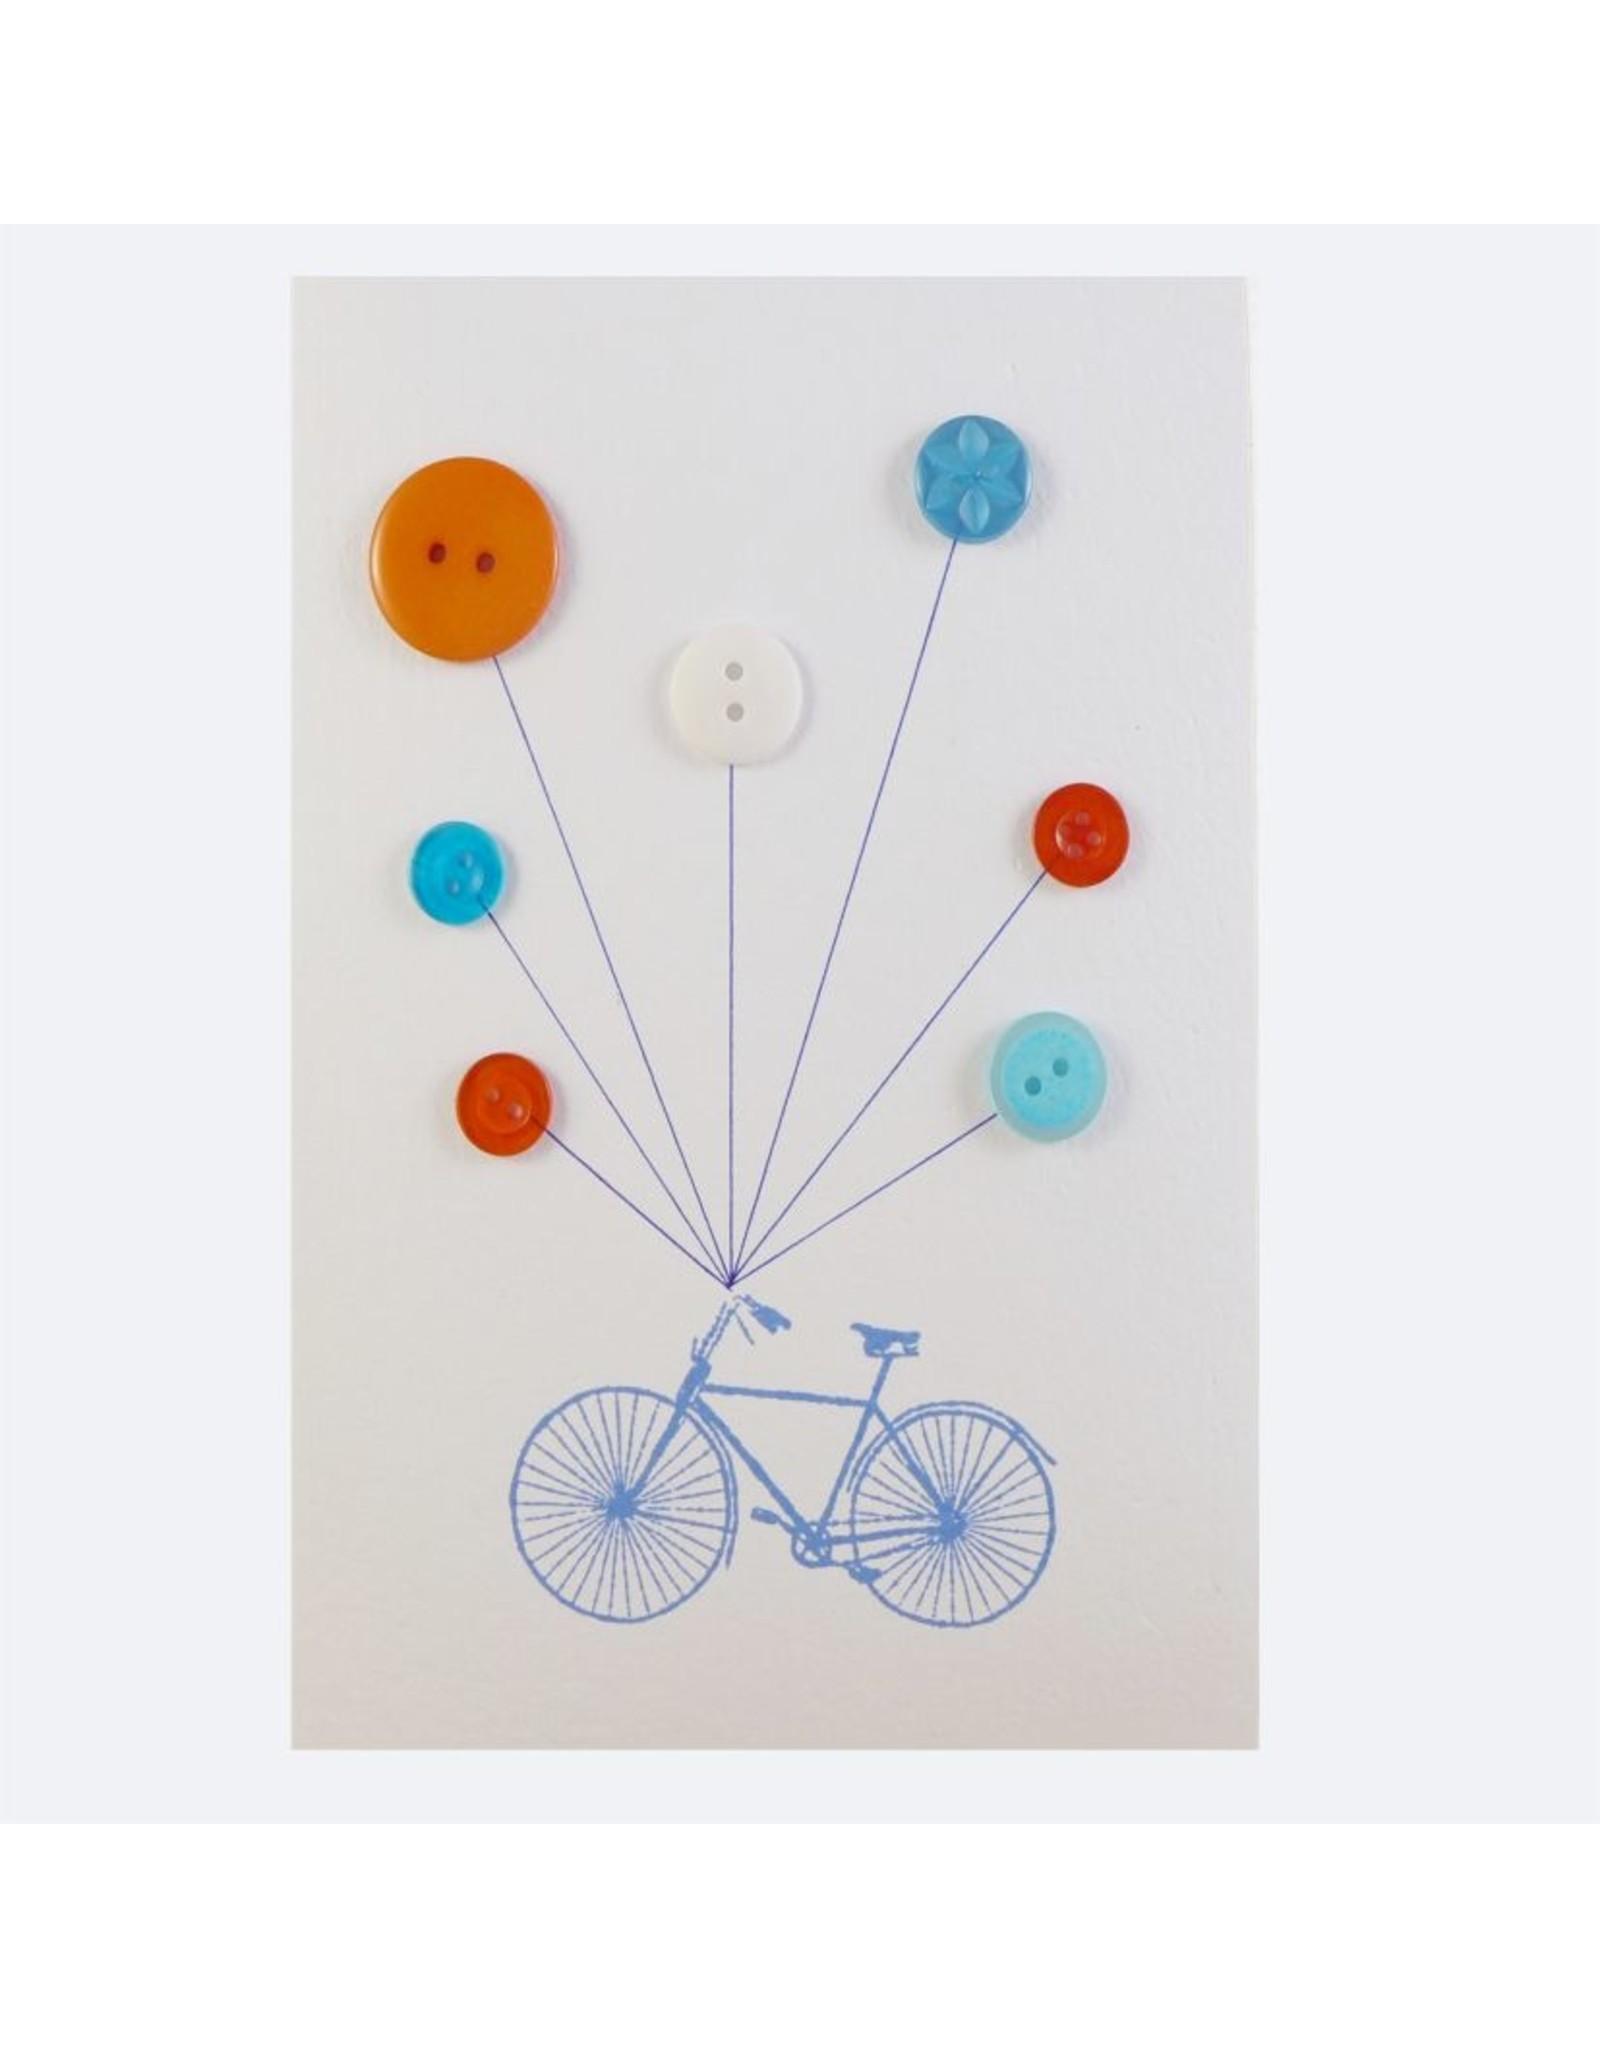 InclusioPlus Velo und Luftballon blau orange